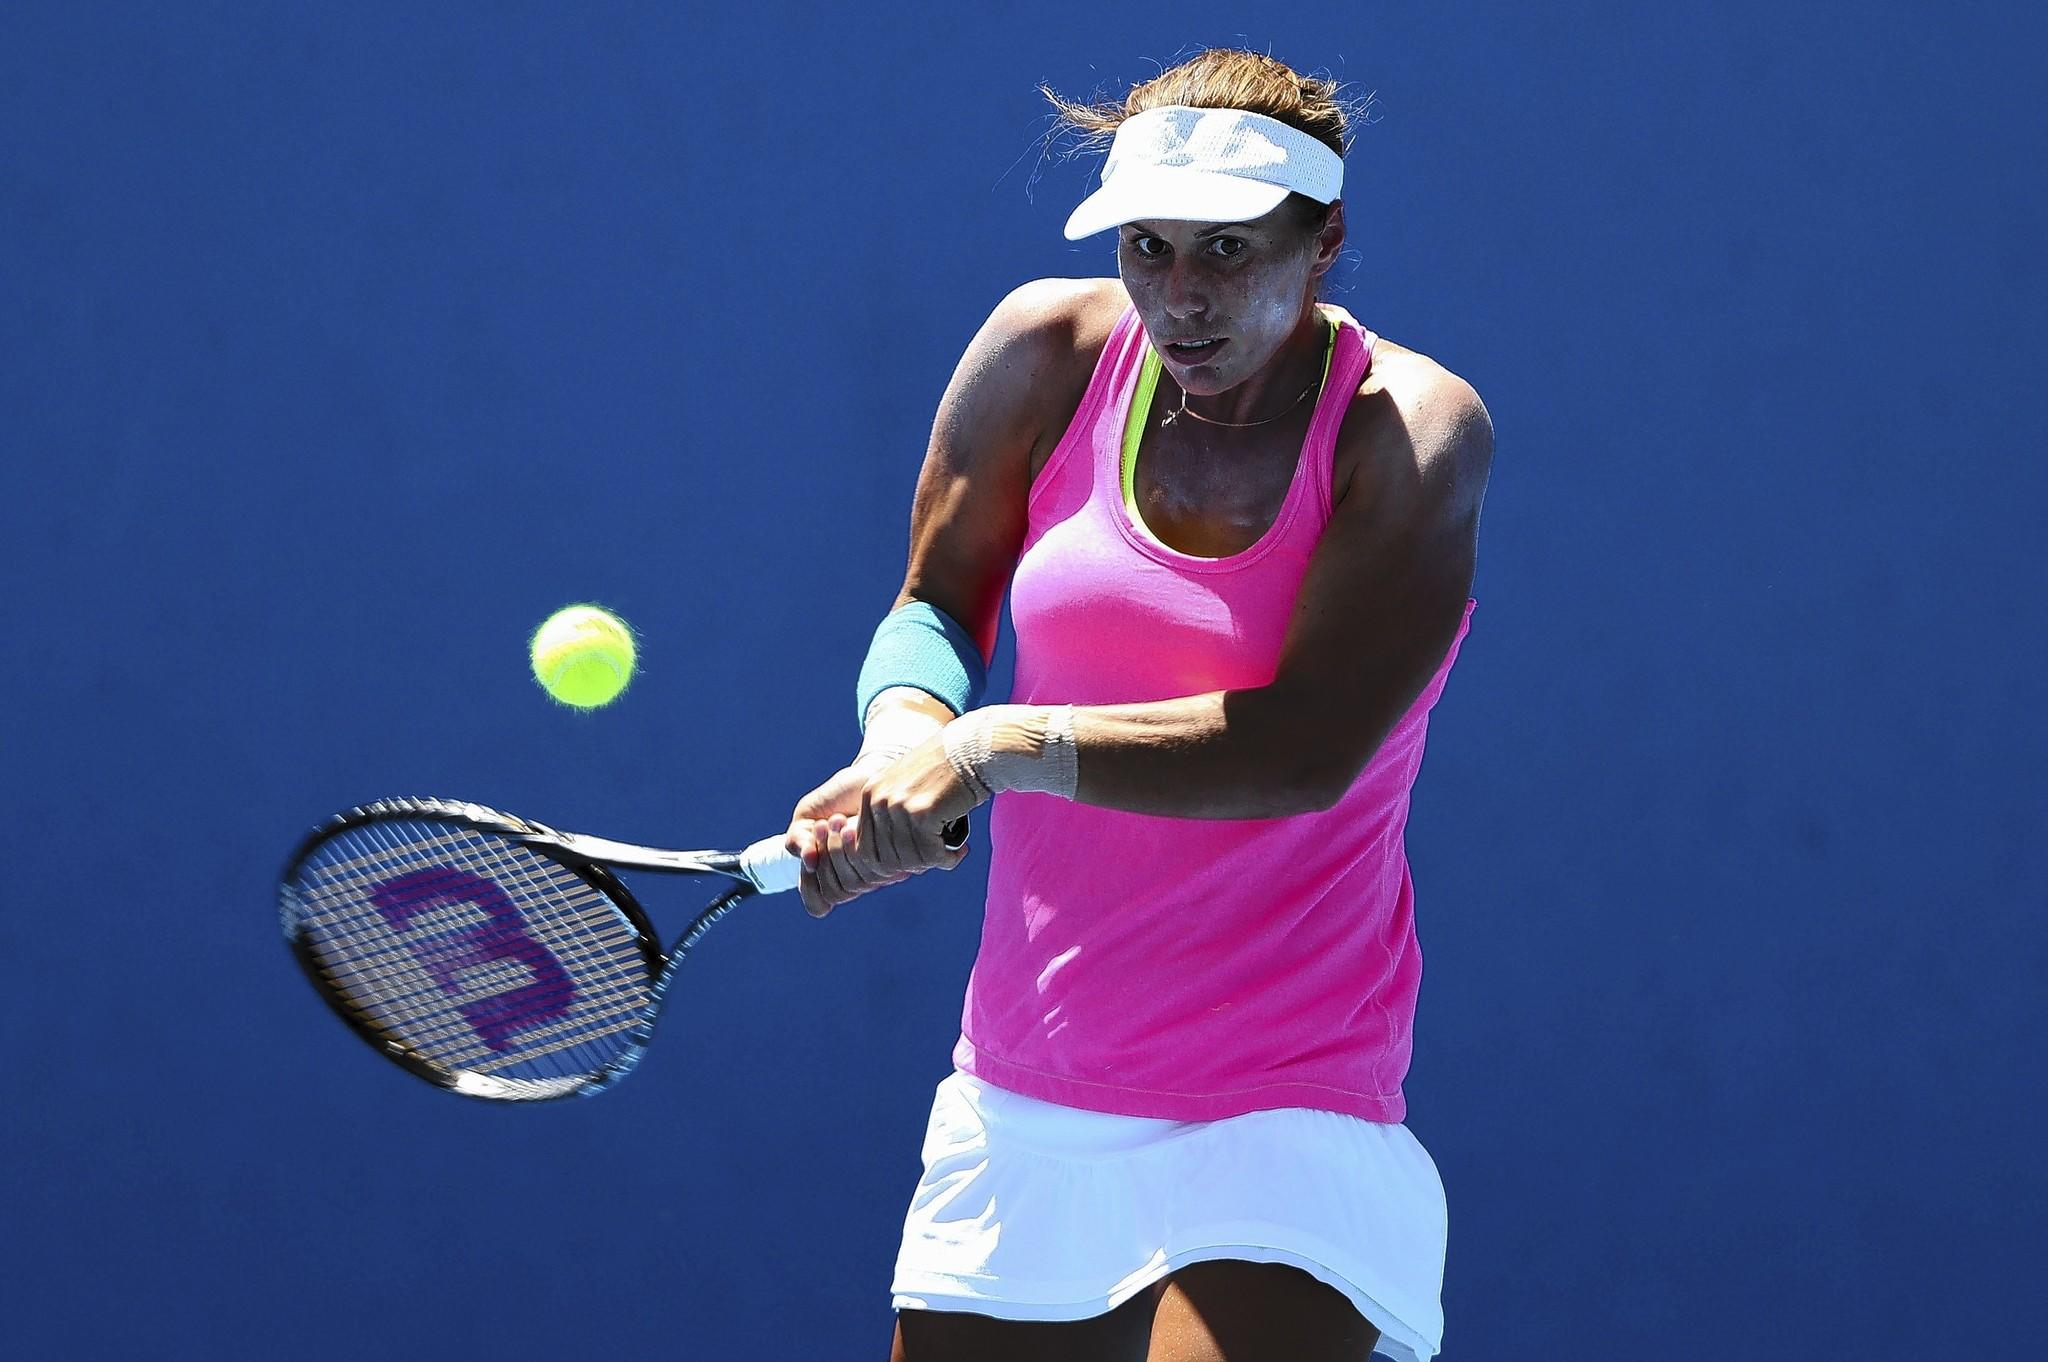 Varvara Lepchenko wins match at Australian Open ...Varvara Lepchenko Matches